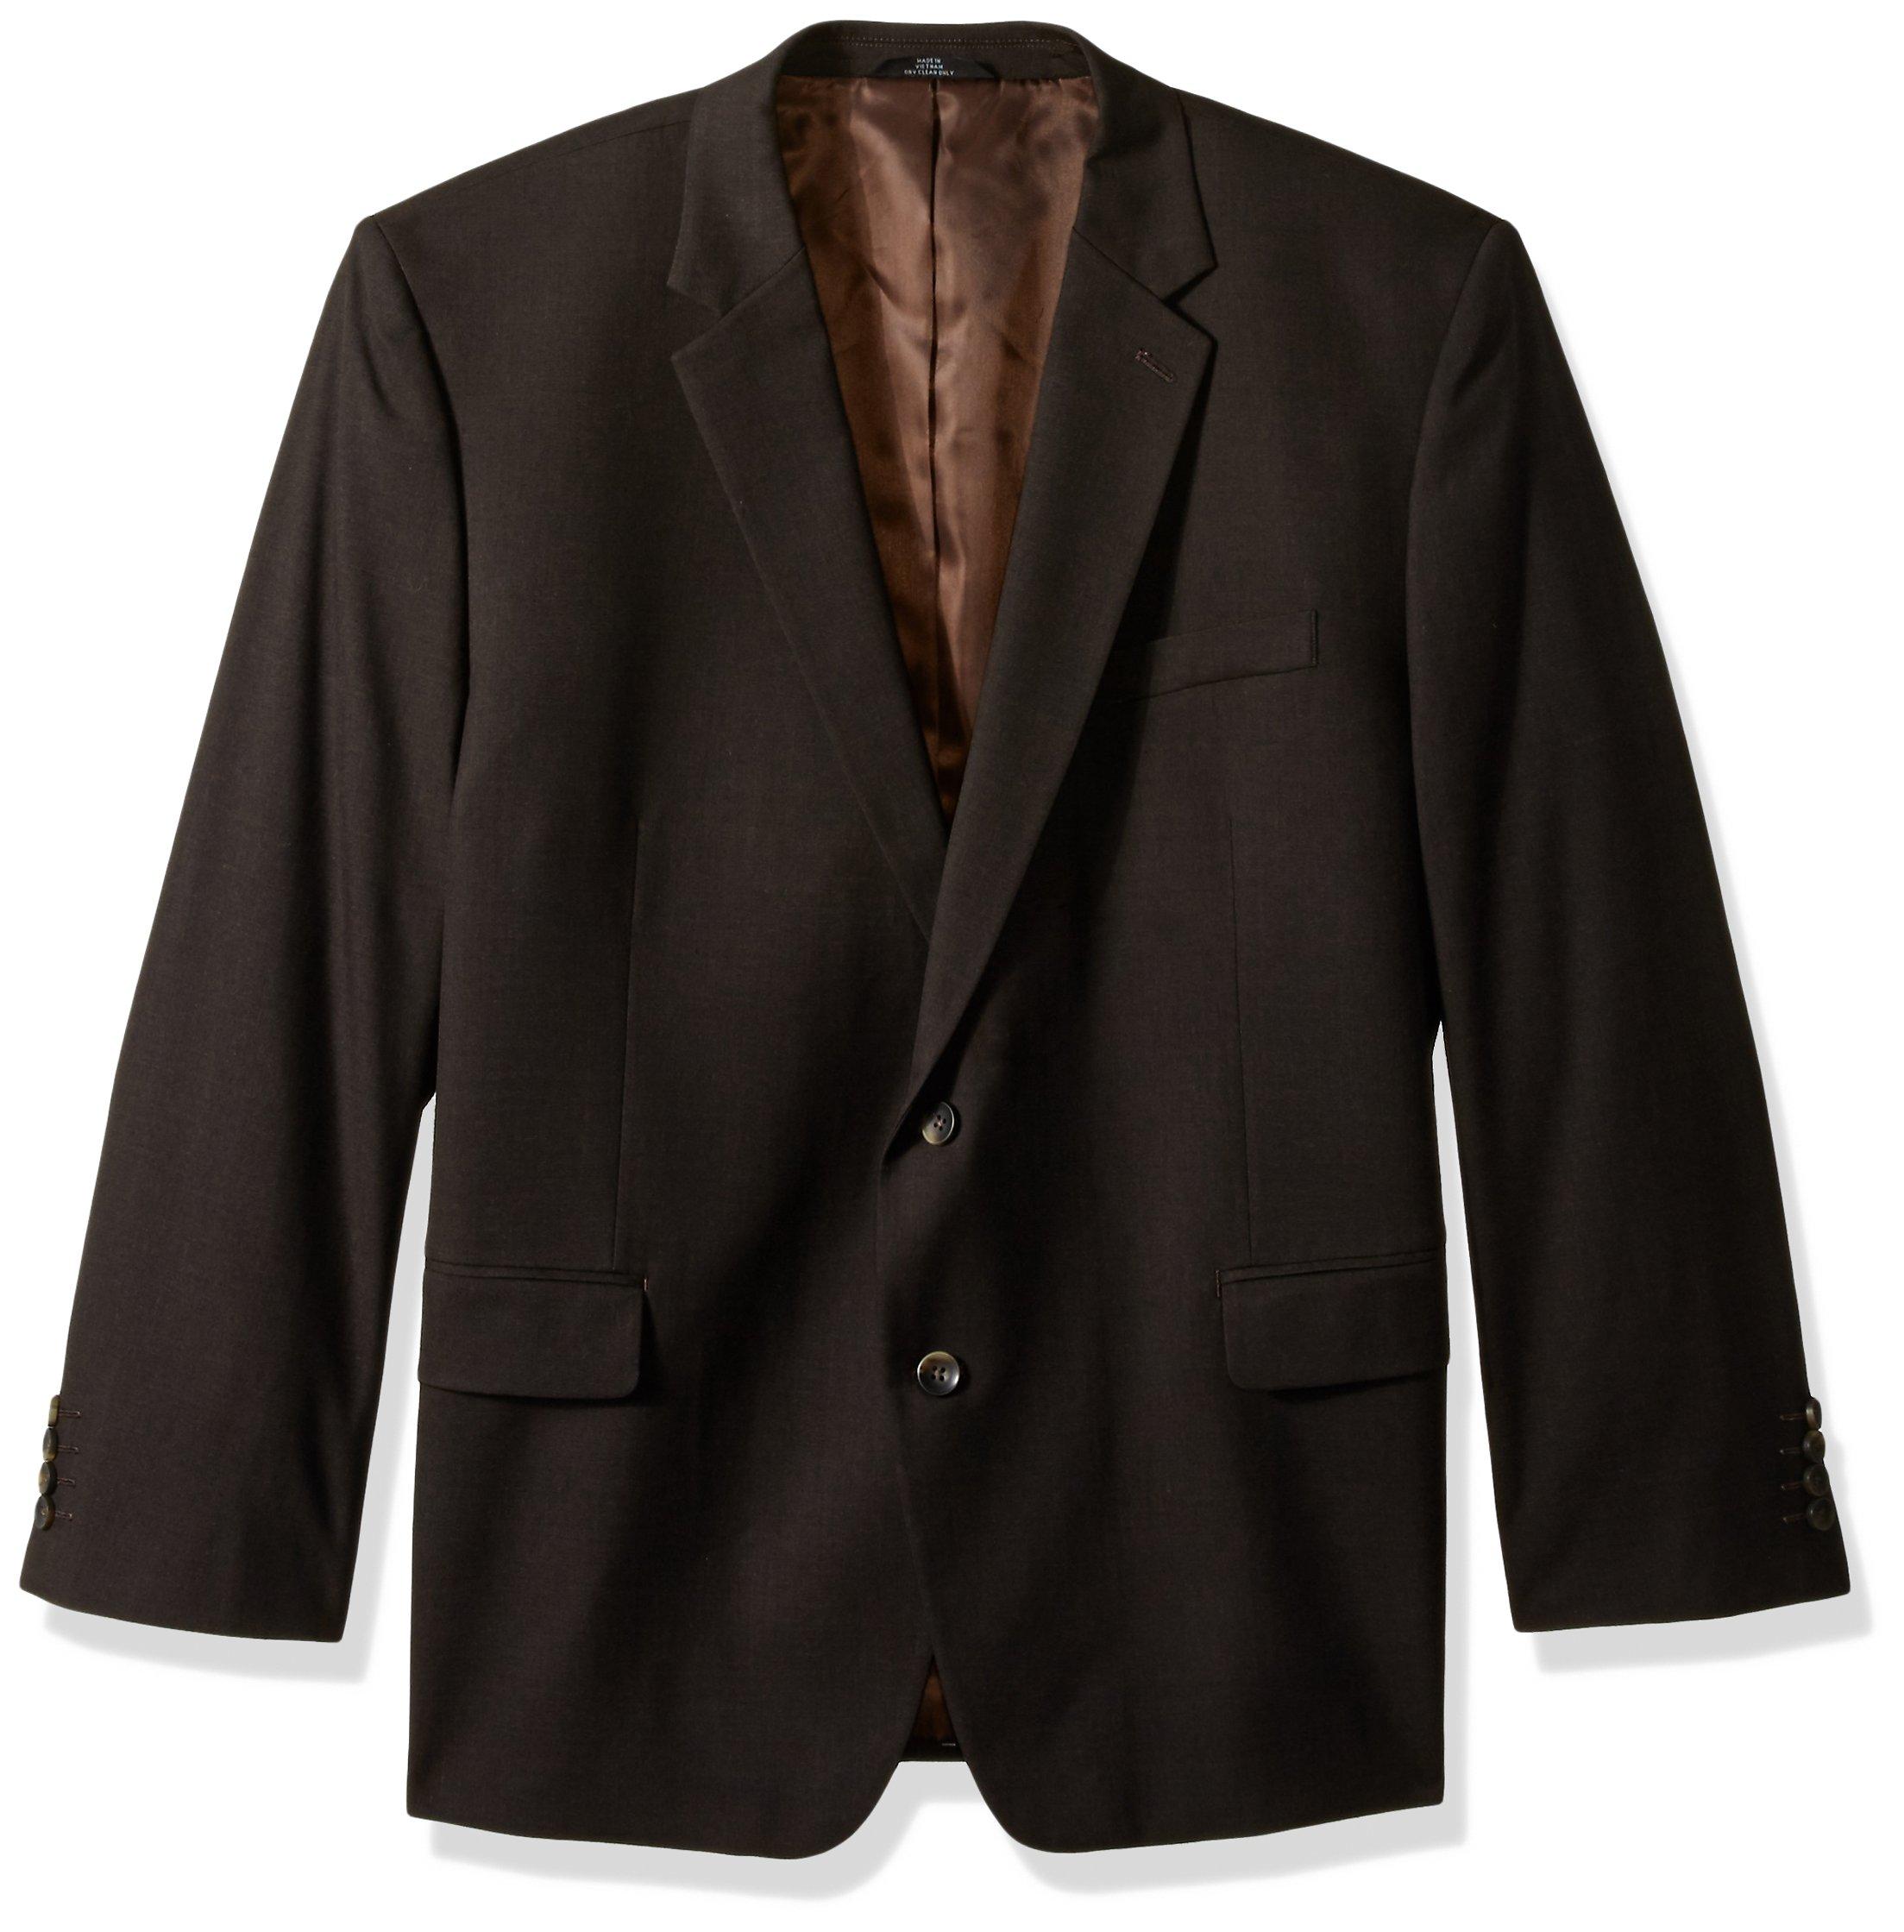 Haggar Men's Big and Tall J.m Premium Stretch Classic Fit 2-Button Coat, Chocolate, 50S